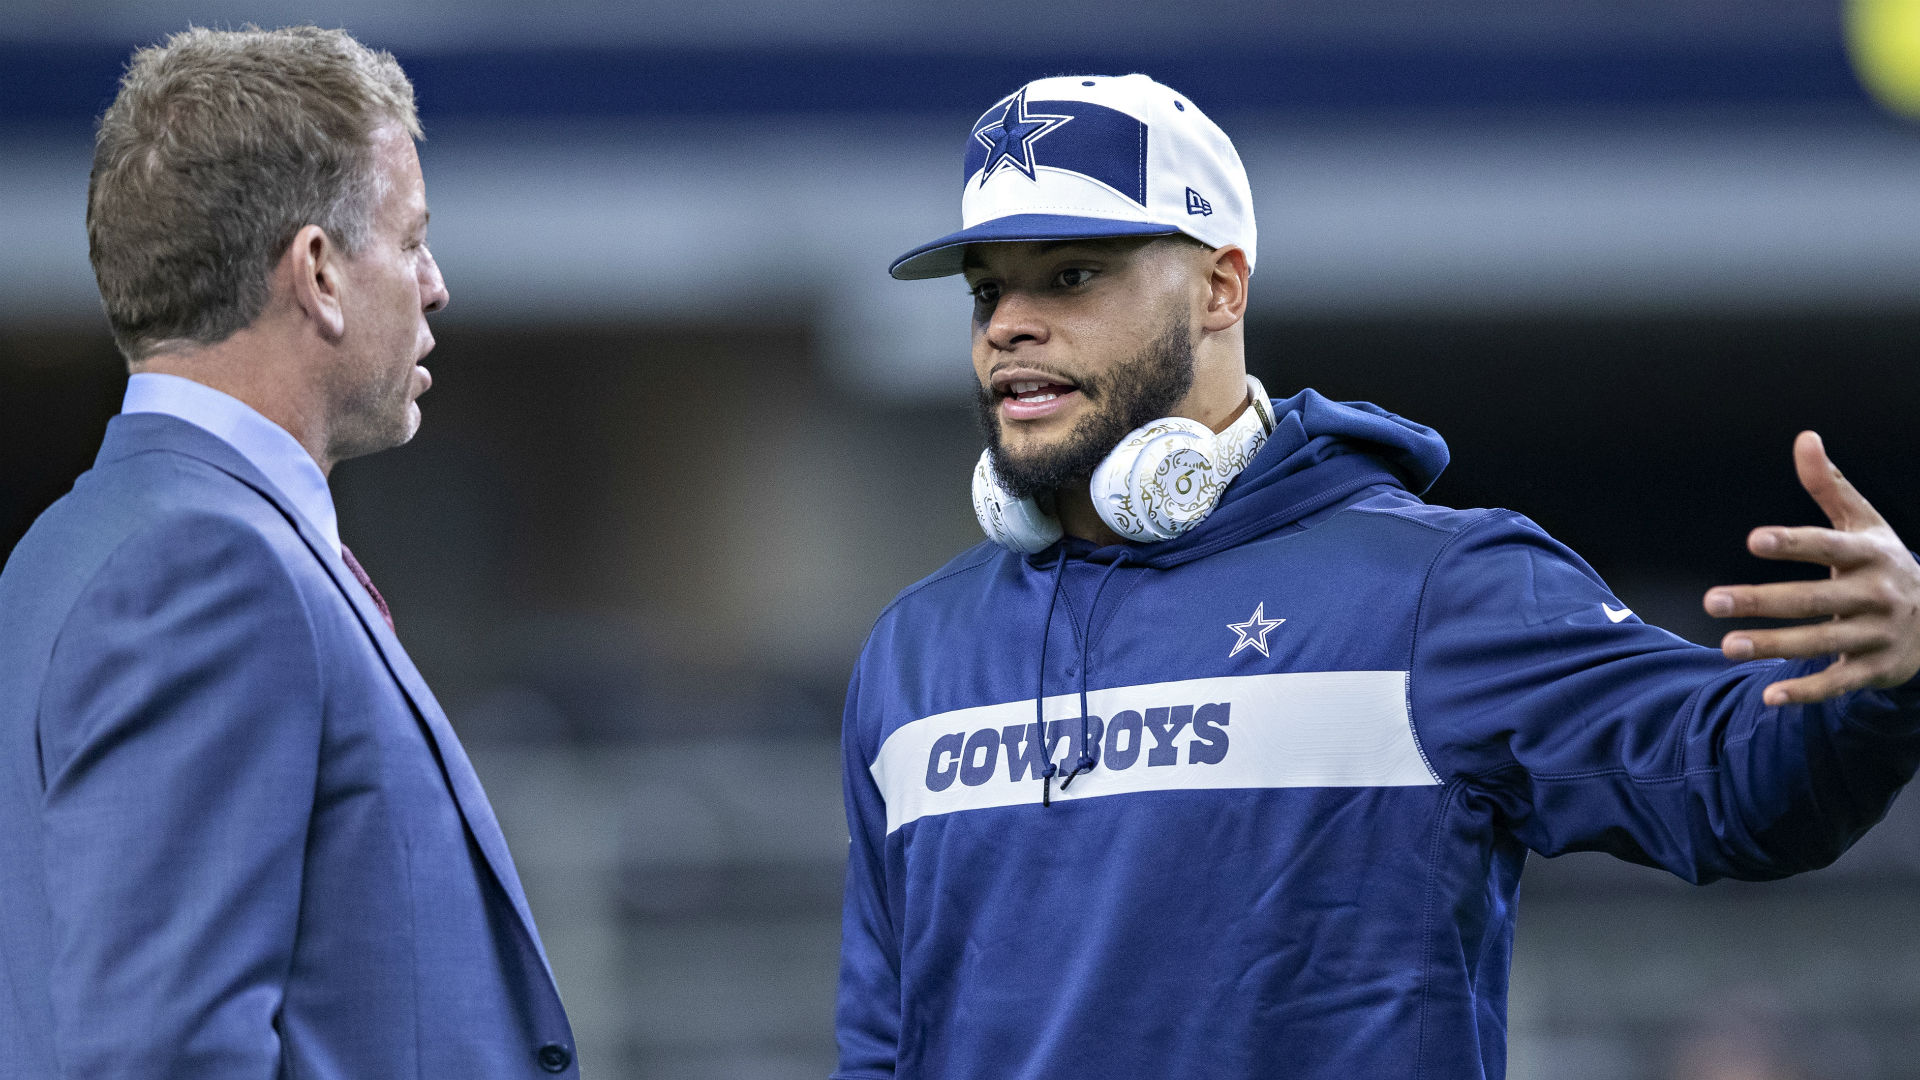 Troy Aikman praises Cowboys QB Dak Prescott: 'He's everything you'd want him to be'